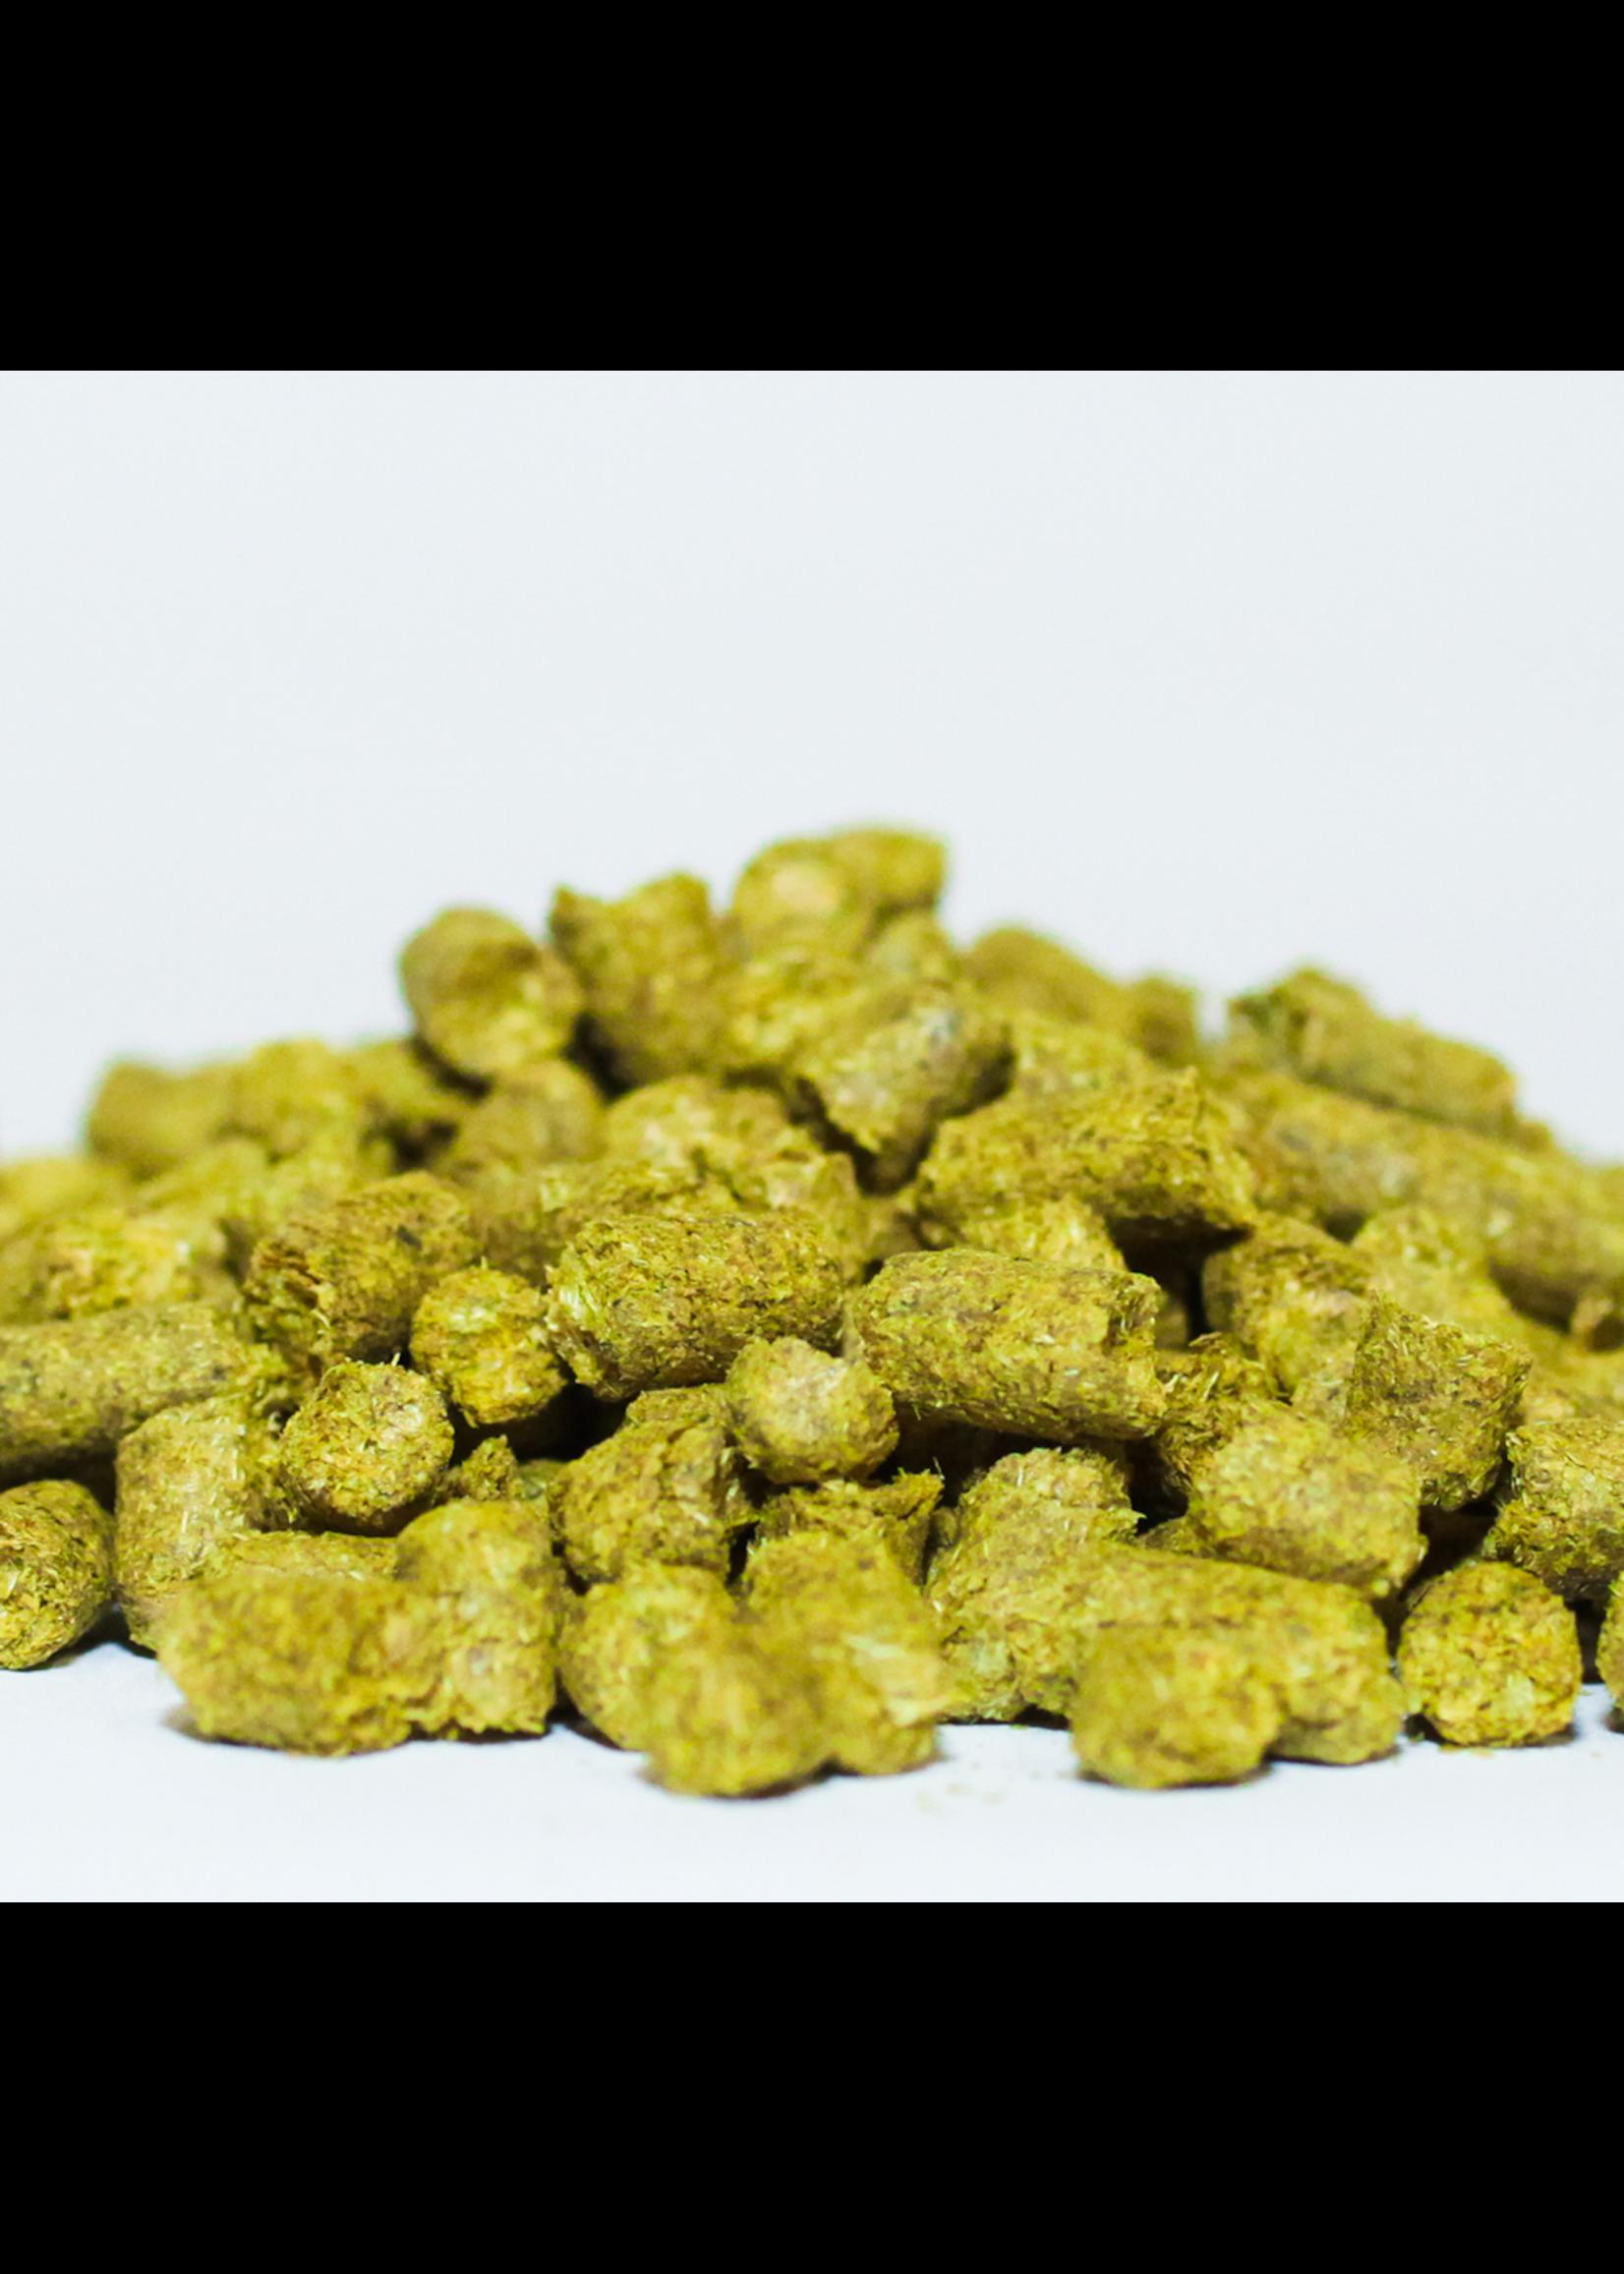 Hops Mosaic Hops (US) - Pellets - 1 oz